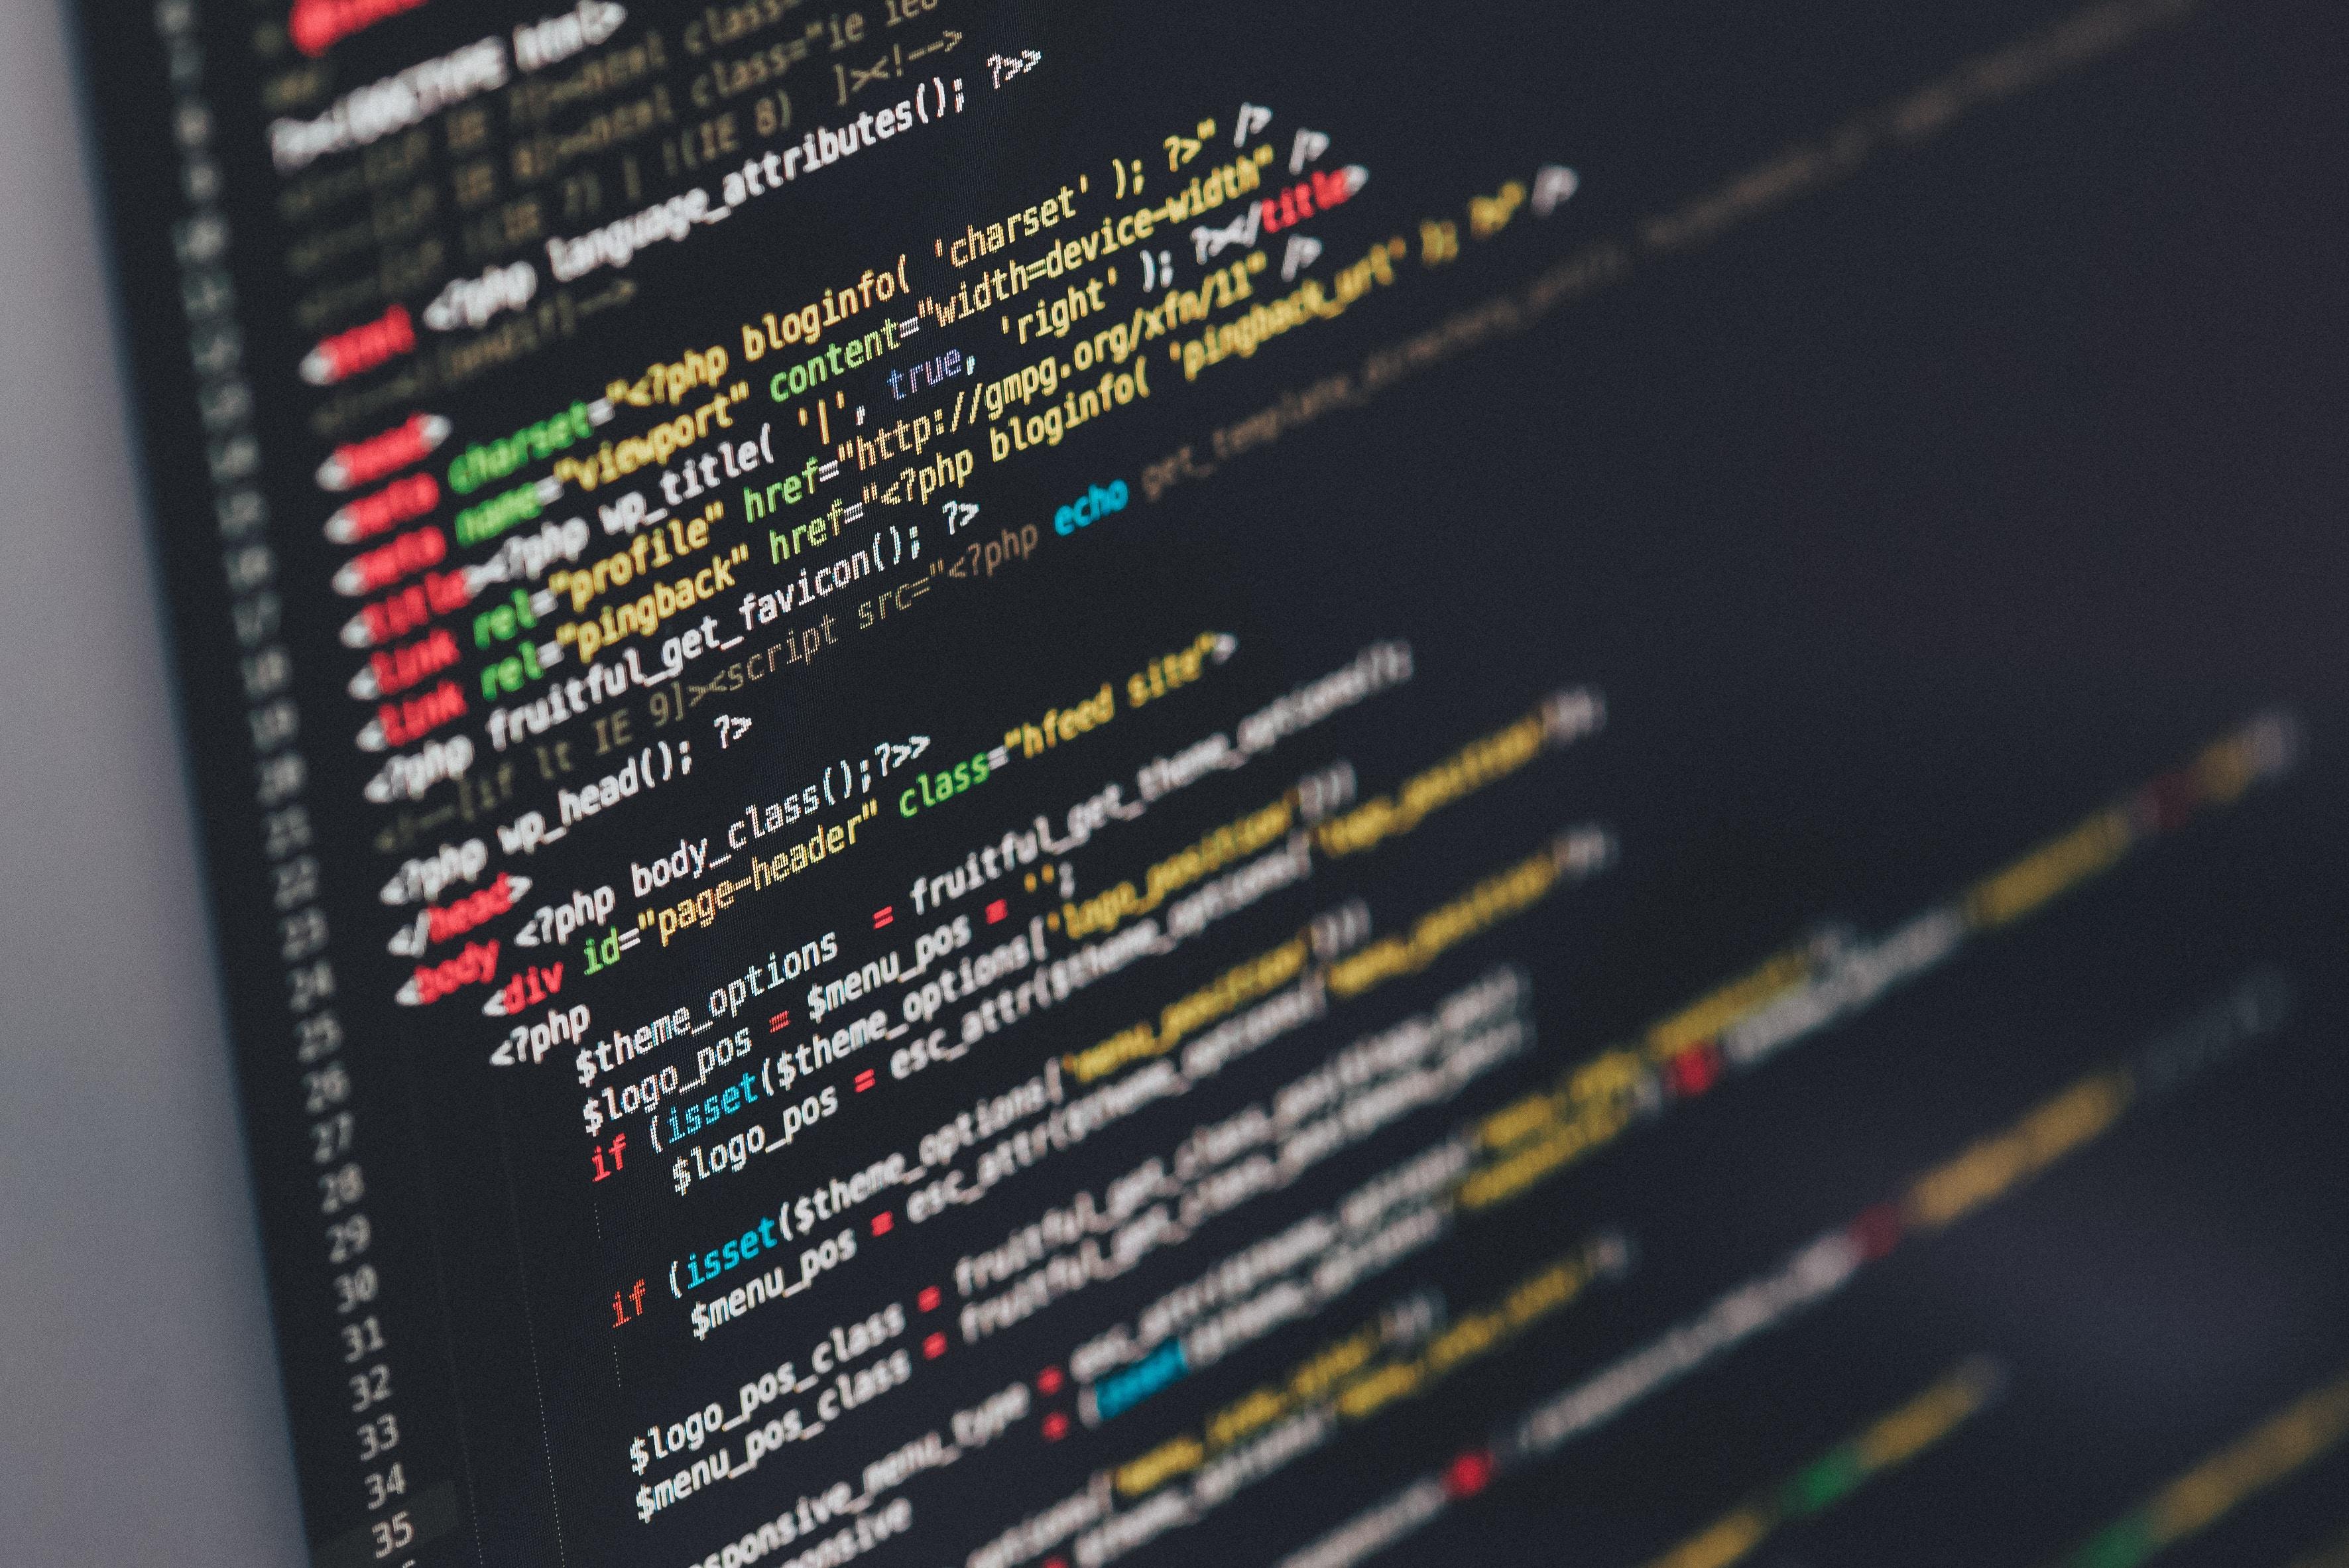 marketing automation technological advances code data